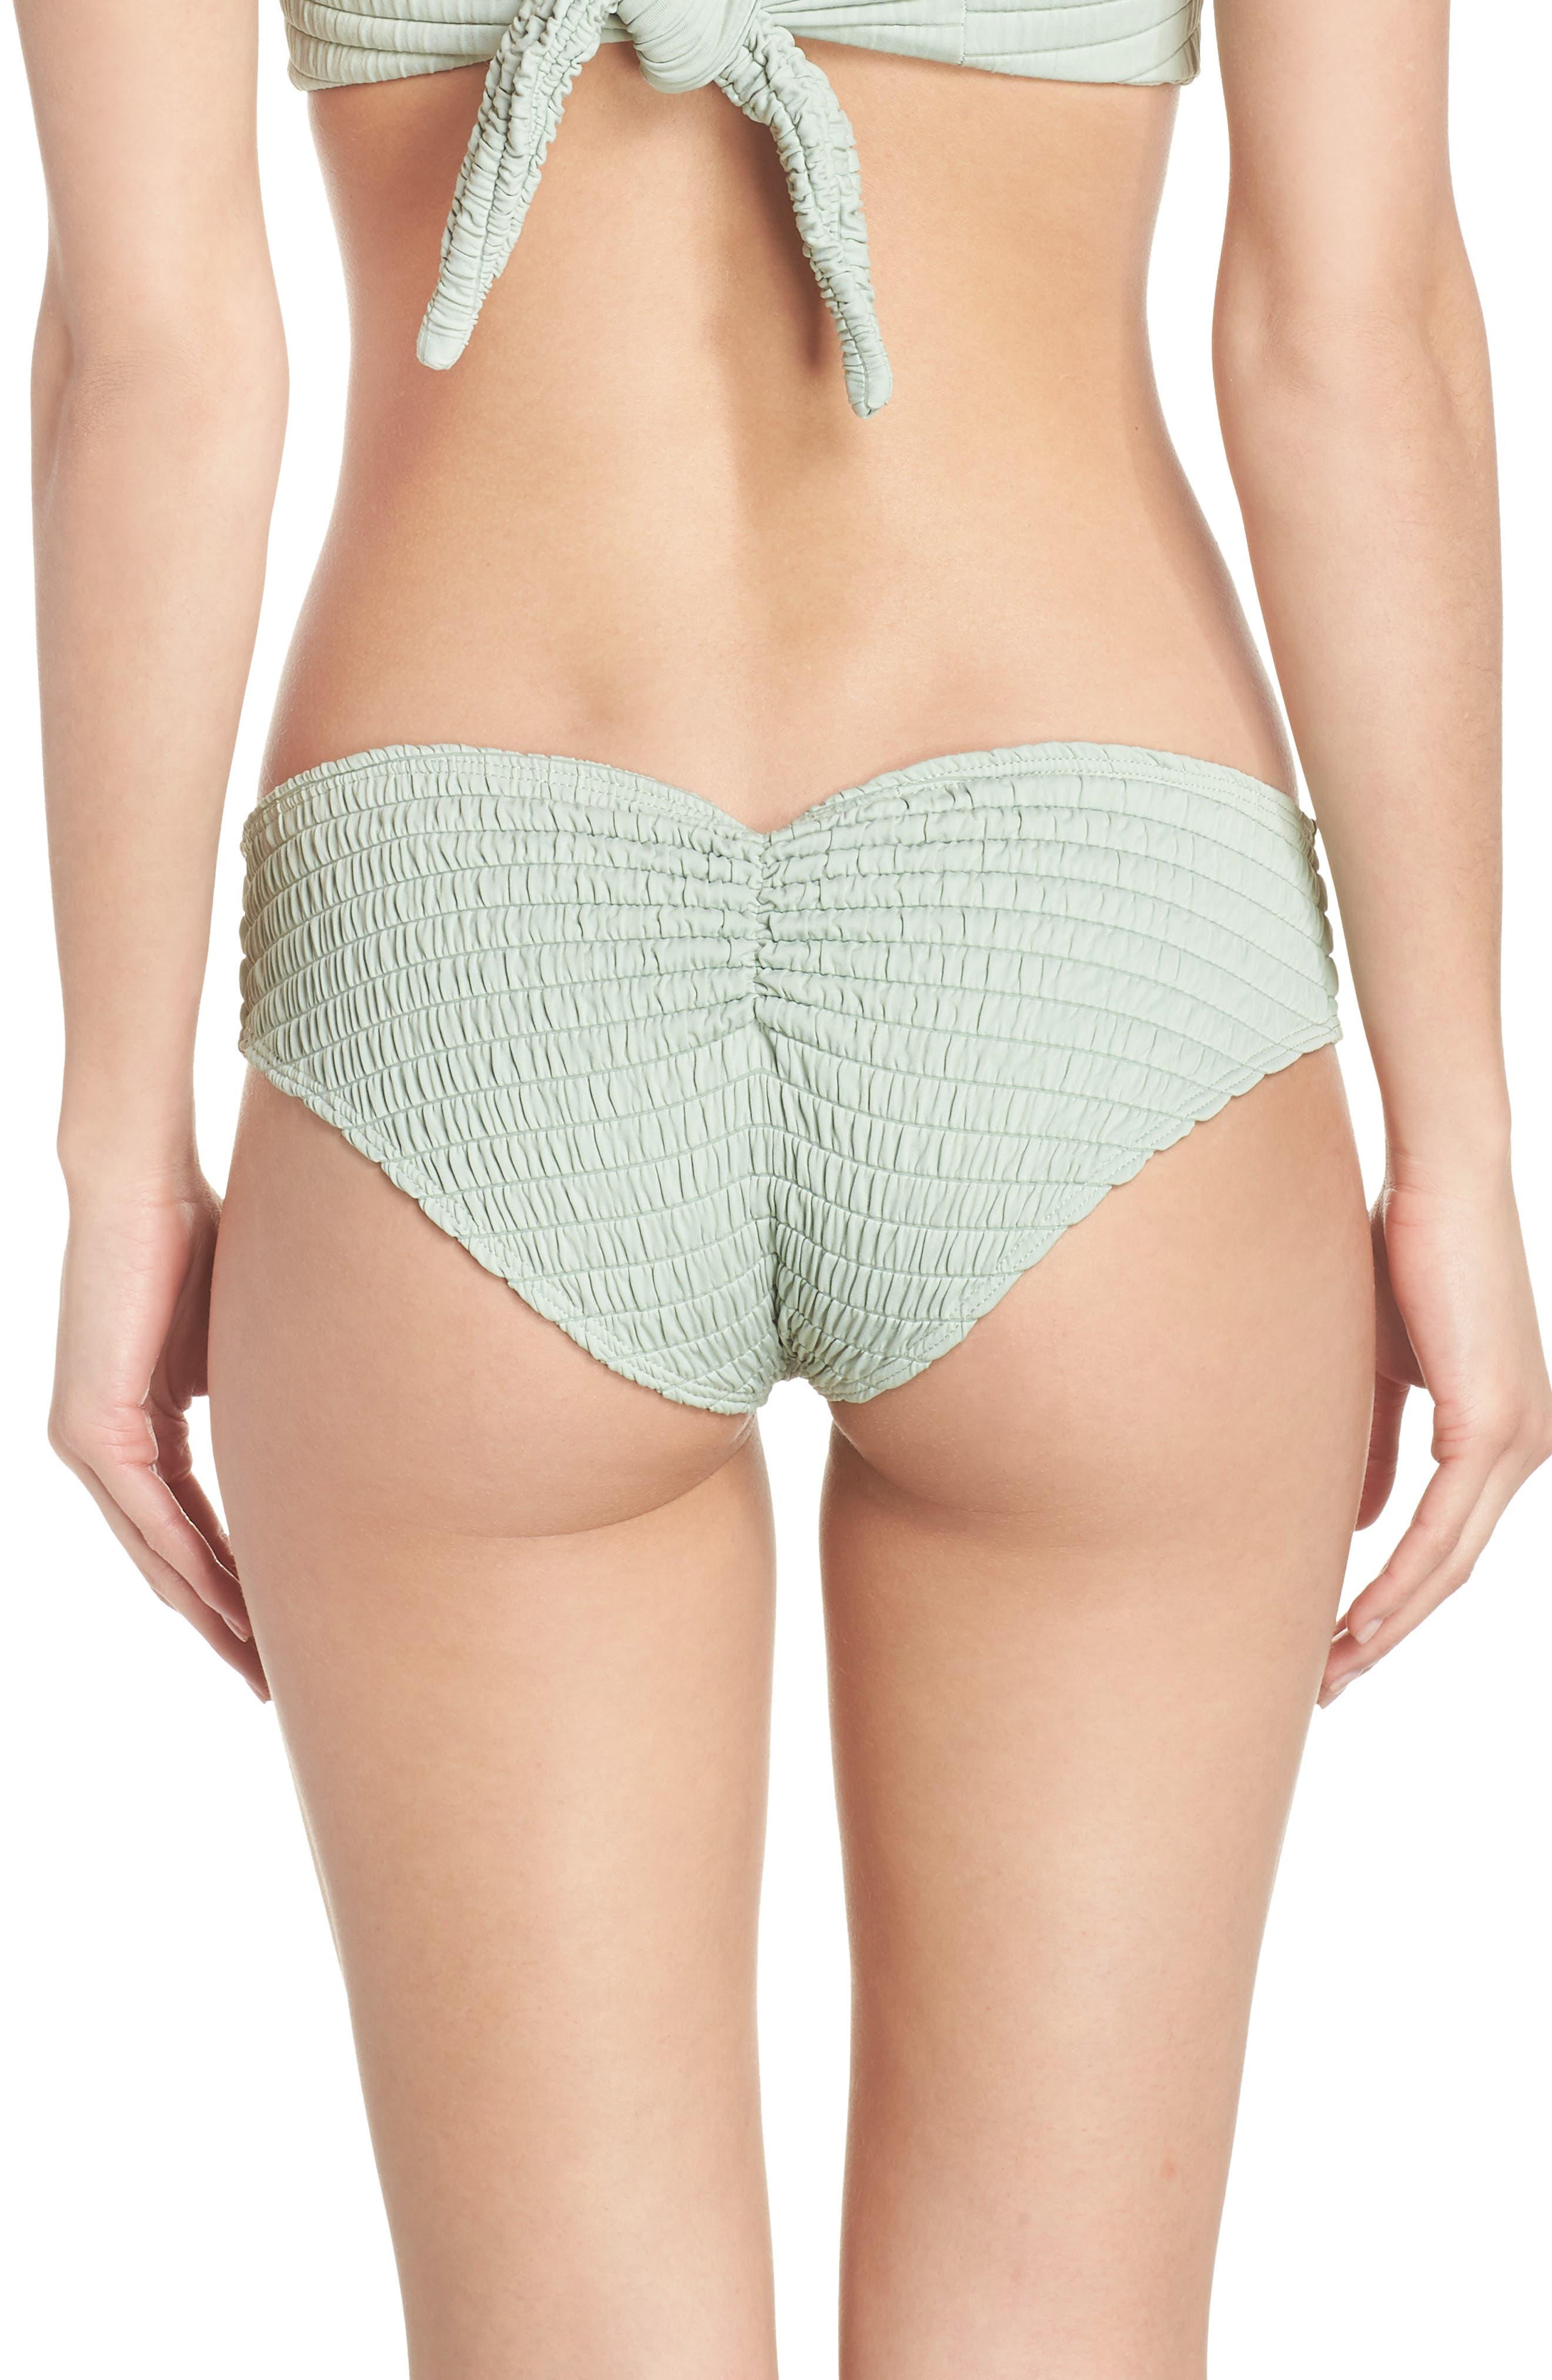 AC Nu Micro Bikini Bottoms,                             Alternate thumbnail 2, color,                             PISTACHE SCRUNCH GREEN